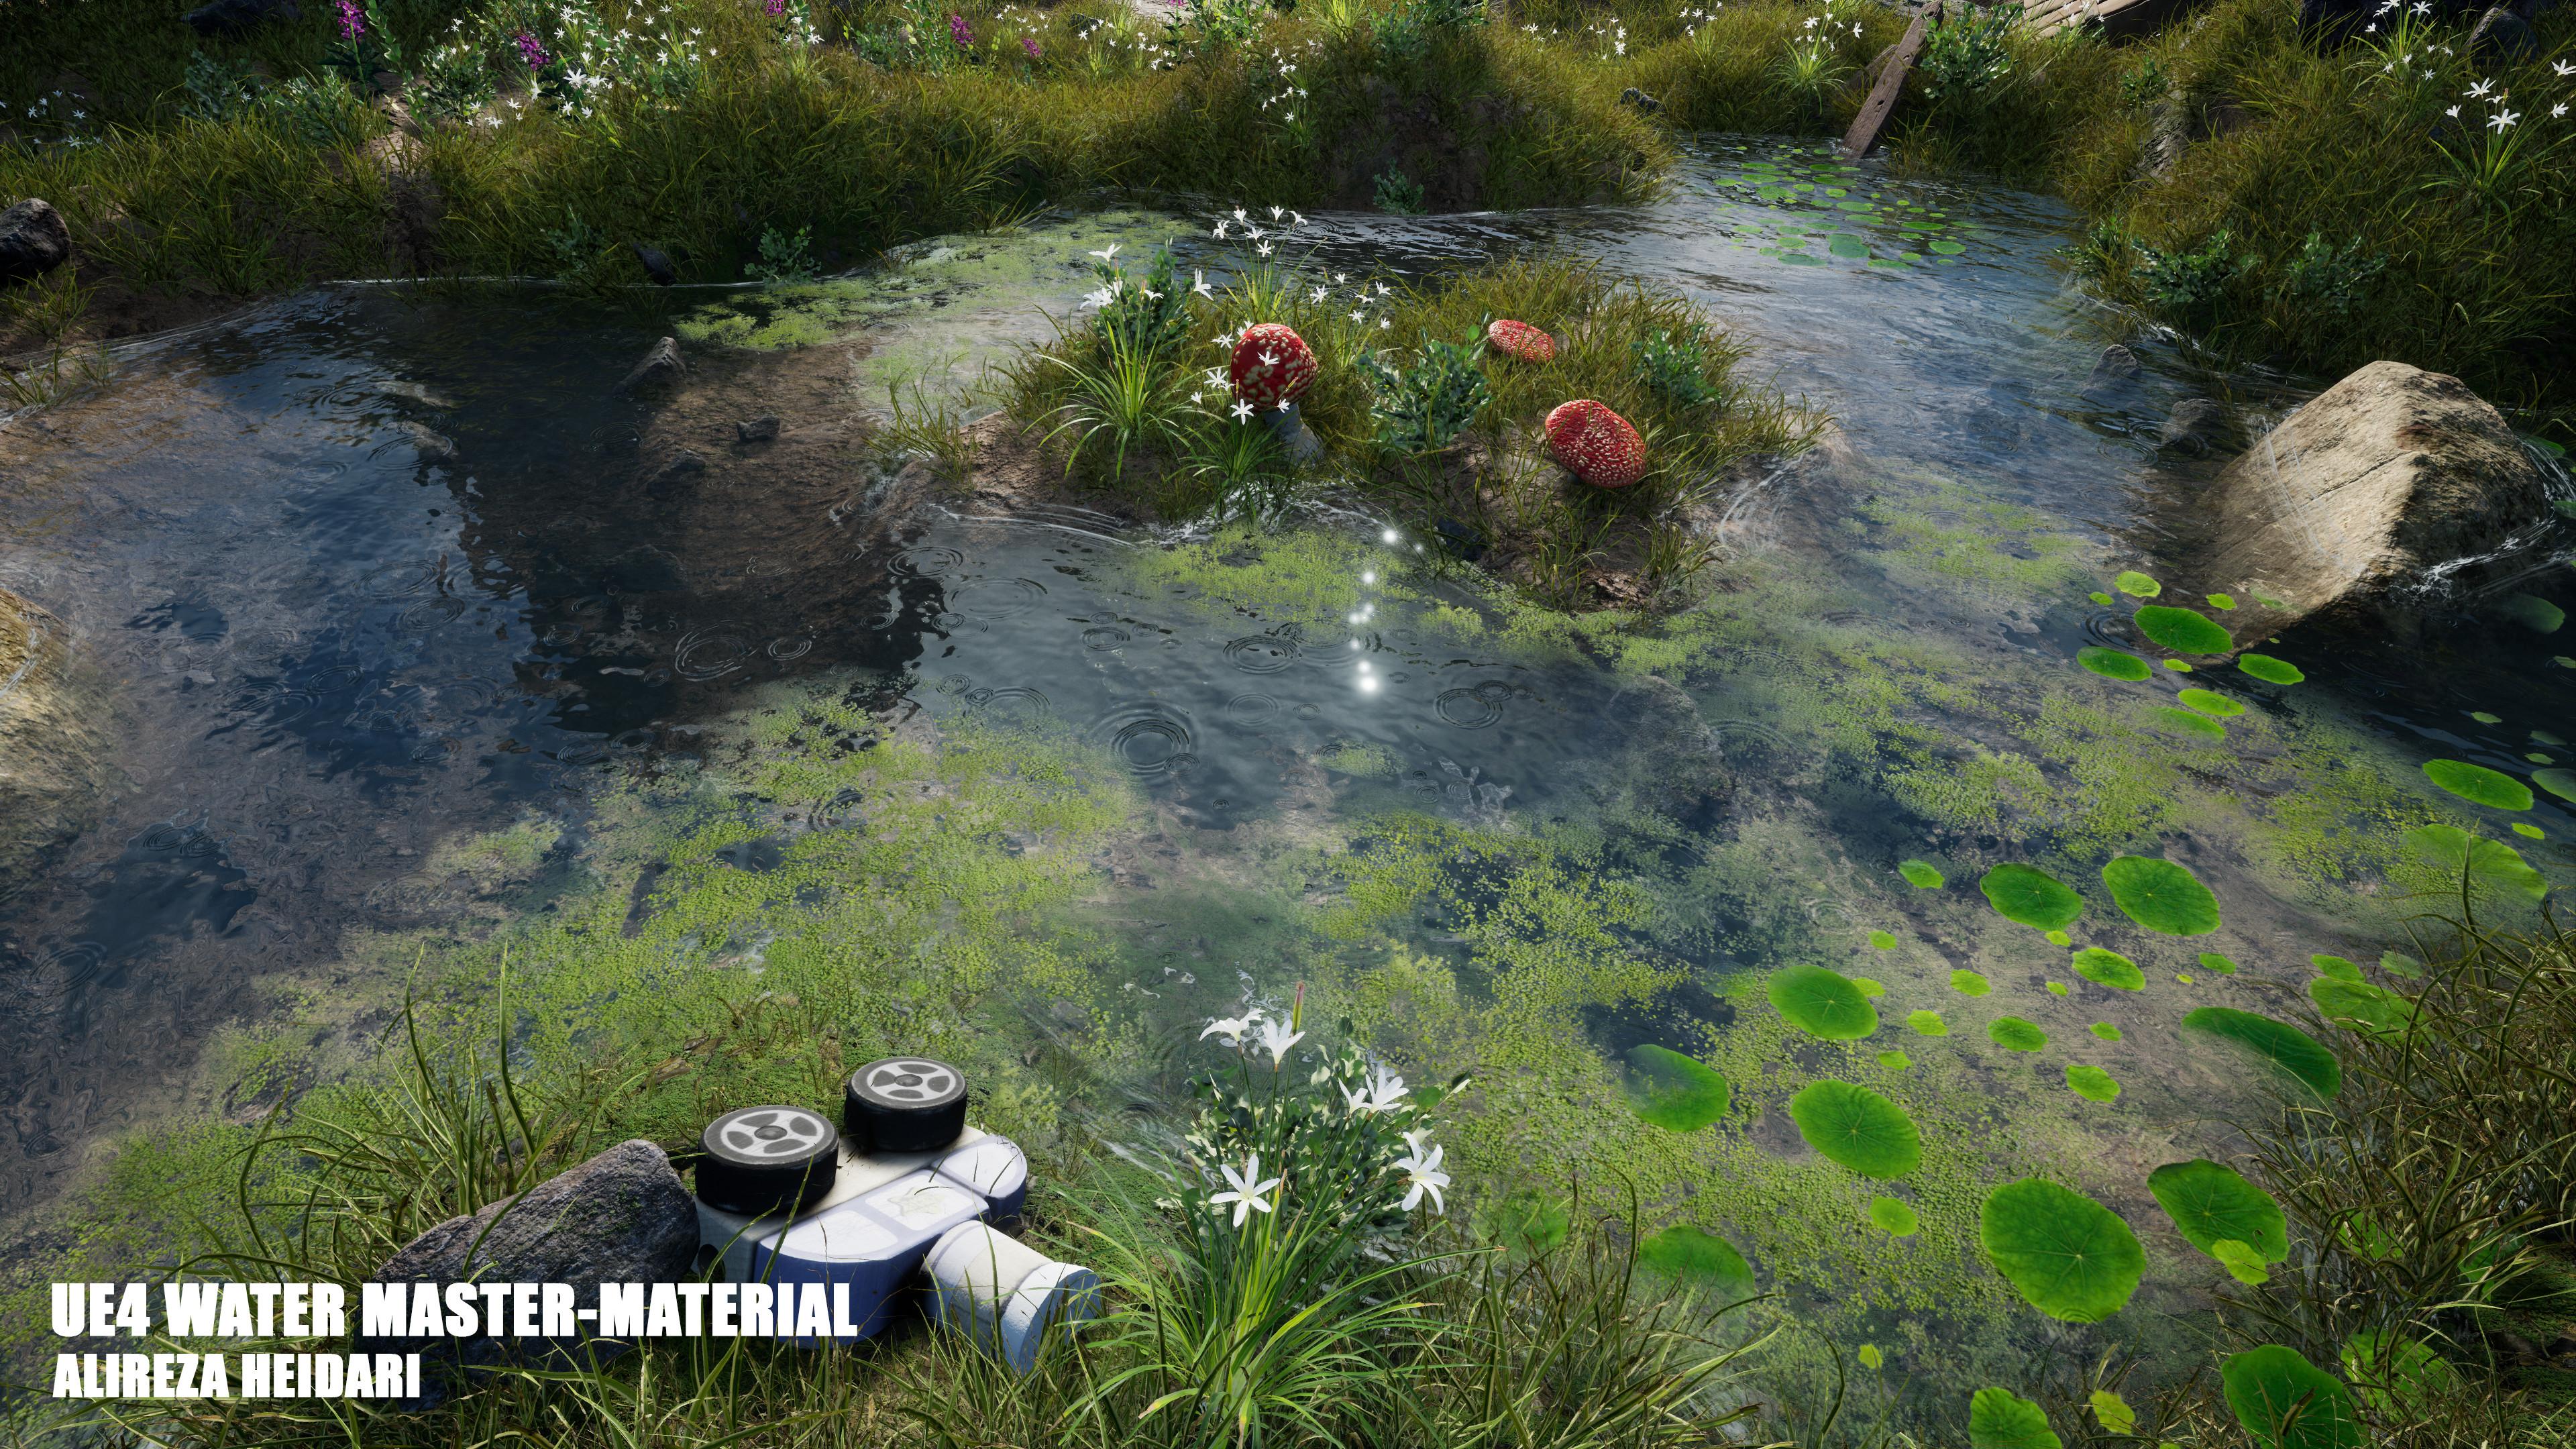 UE4 Customizable Water Master-Material (Vertex Paintable) - Alireza Heidari